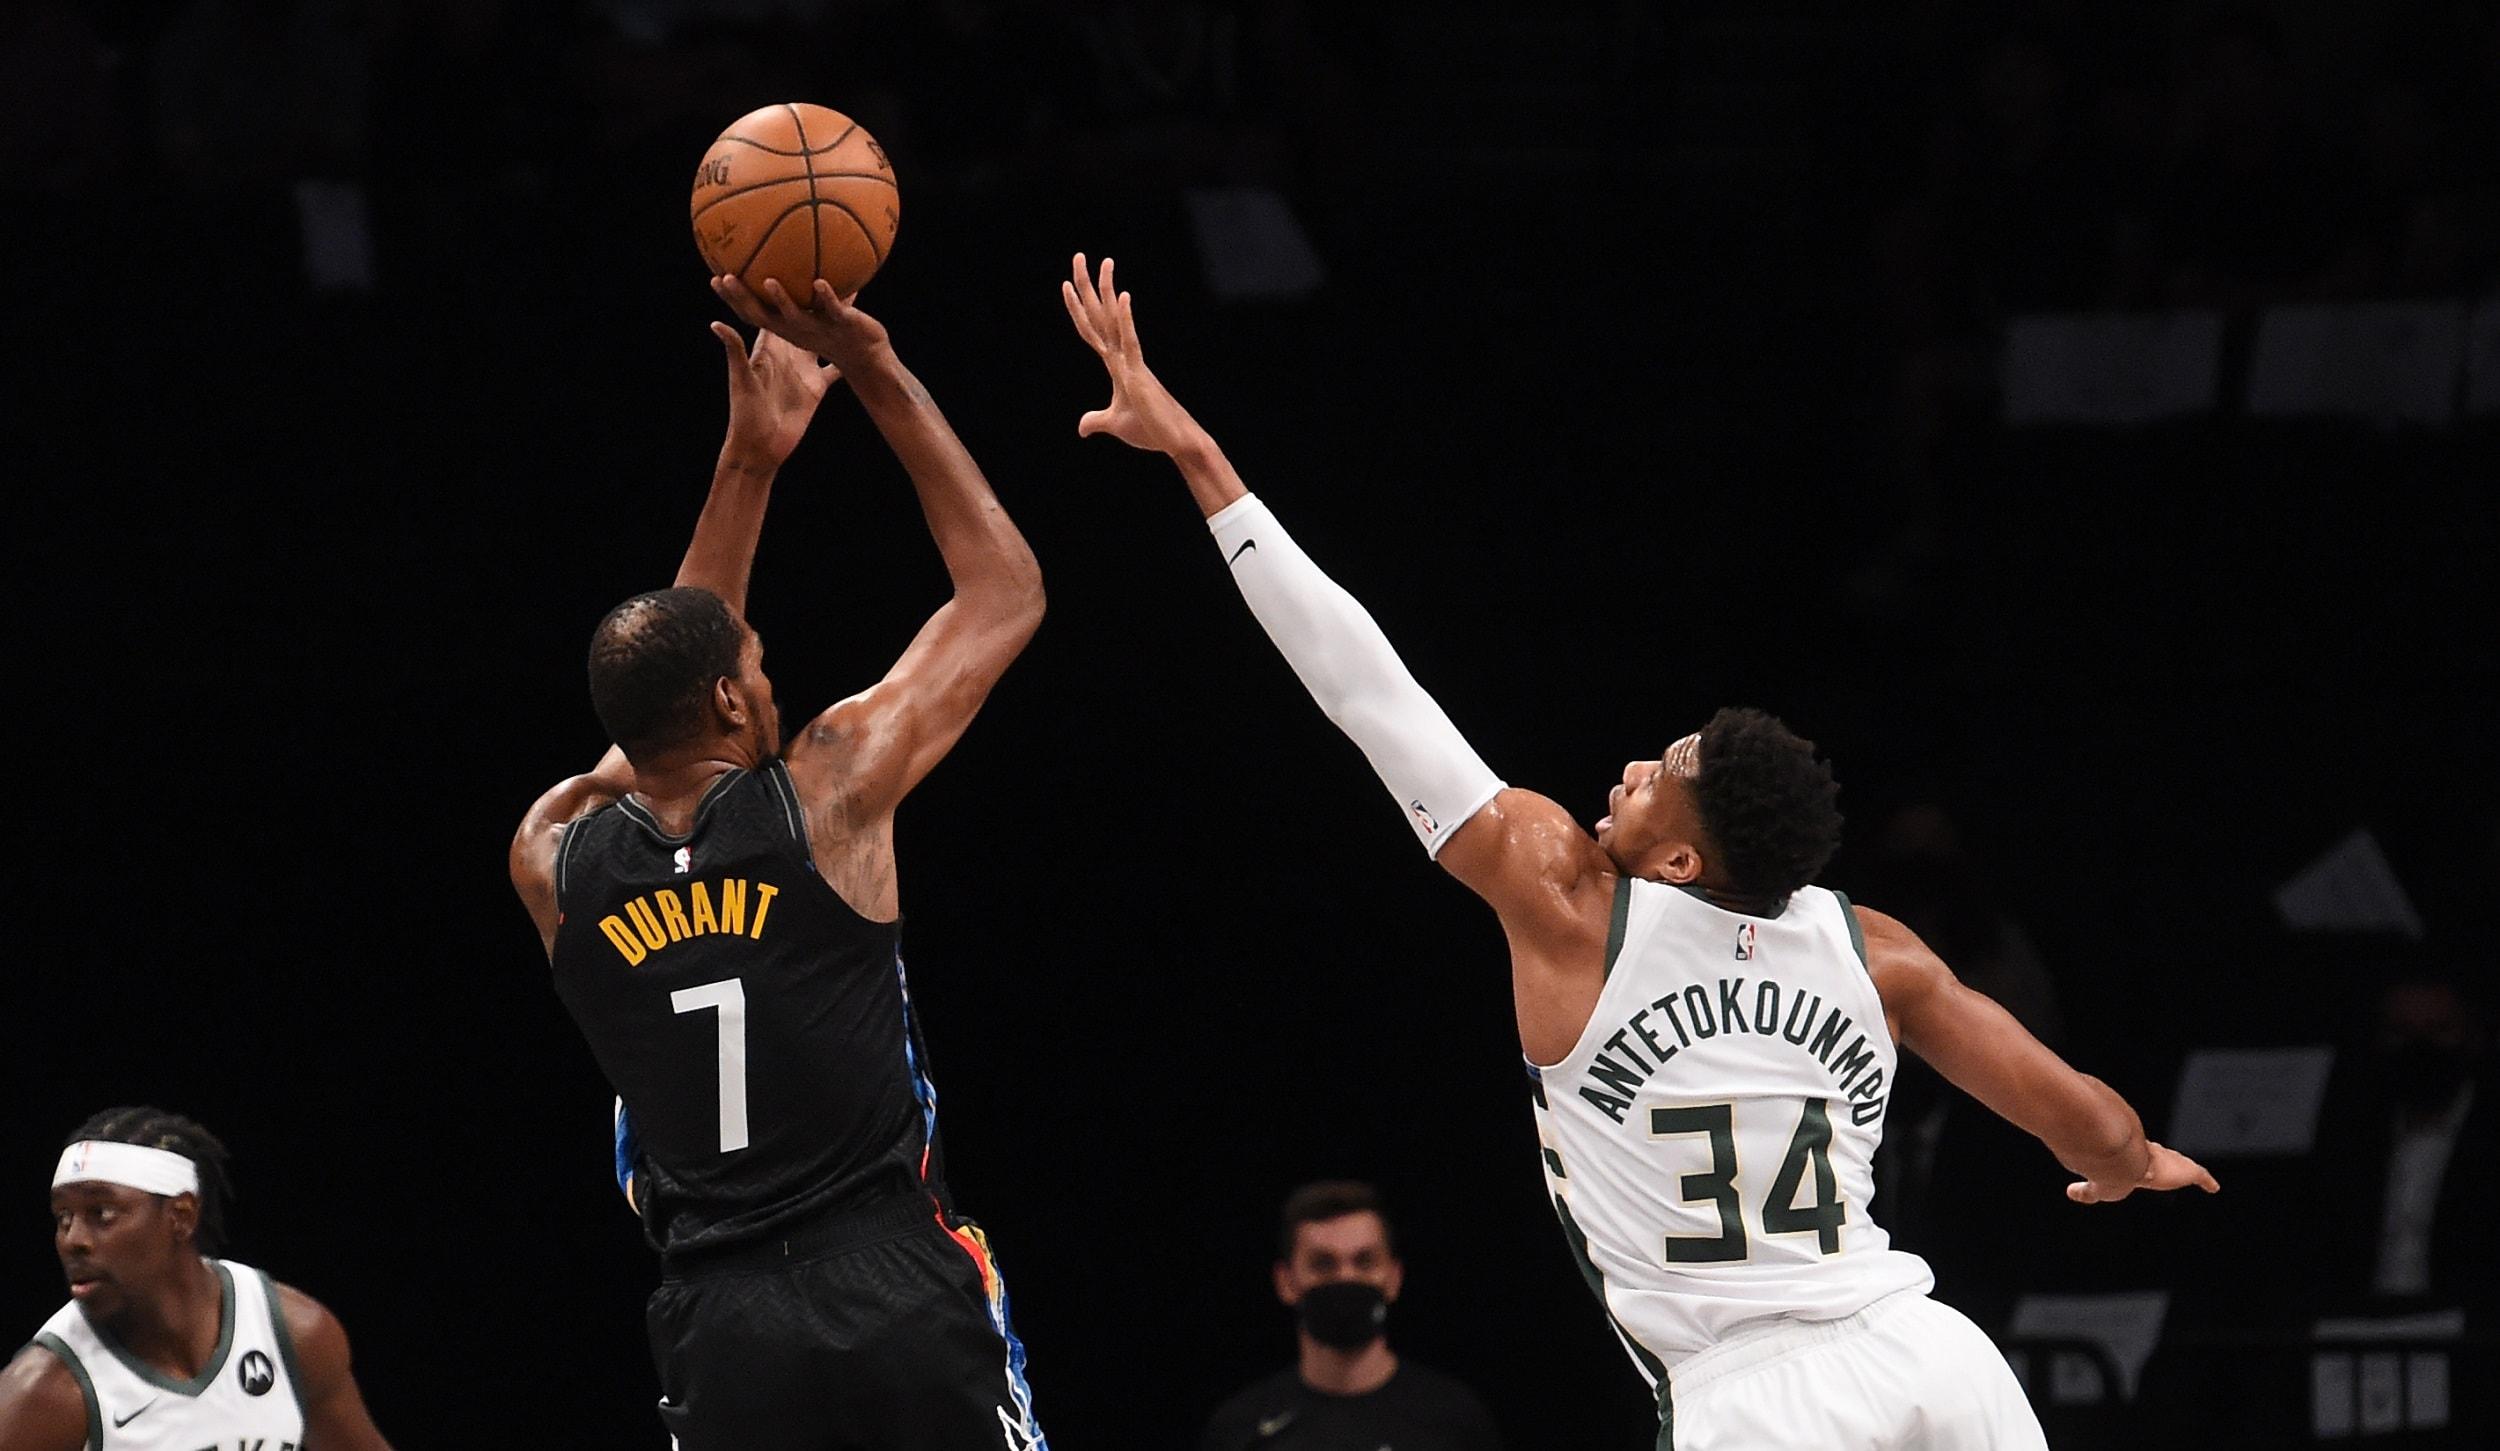 Game 2 Recap: Nets 125, Bucks 86